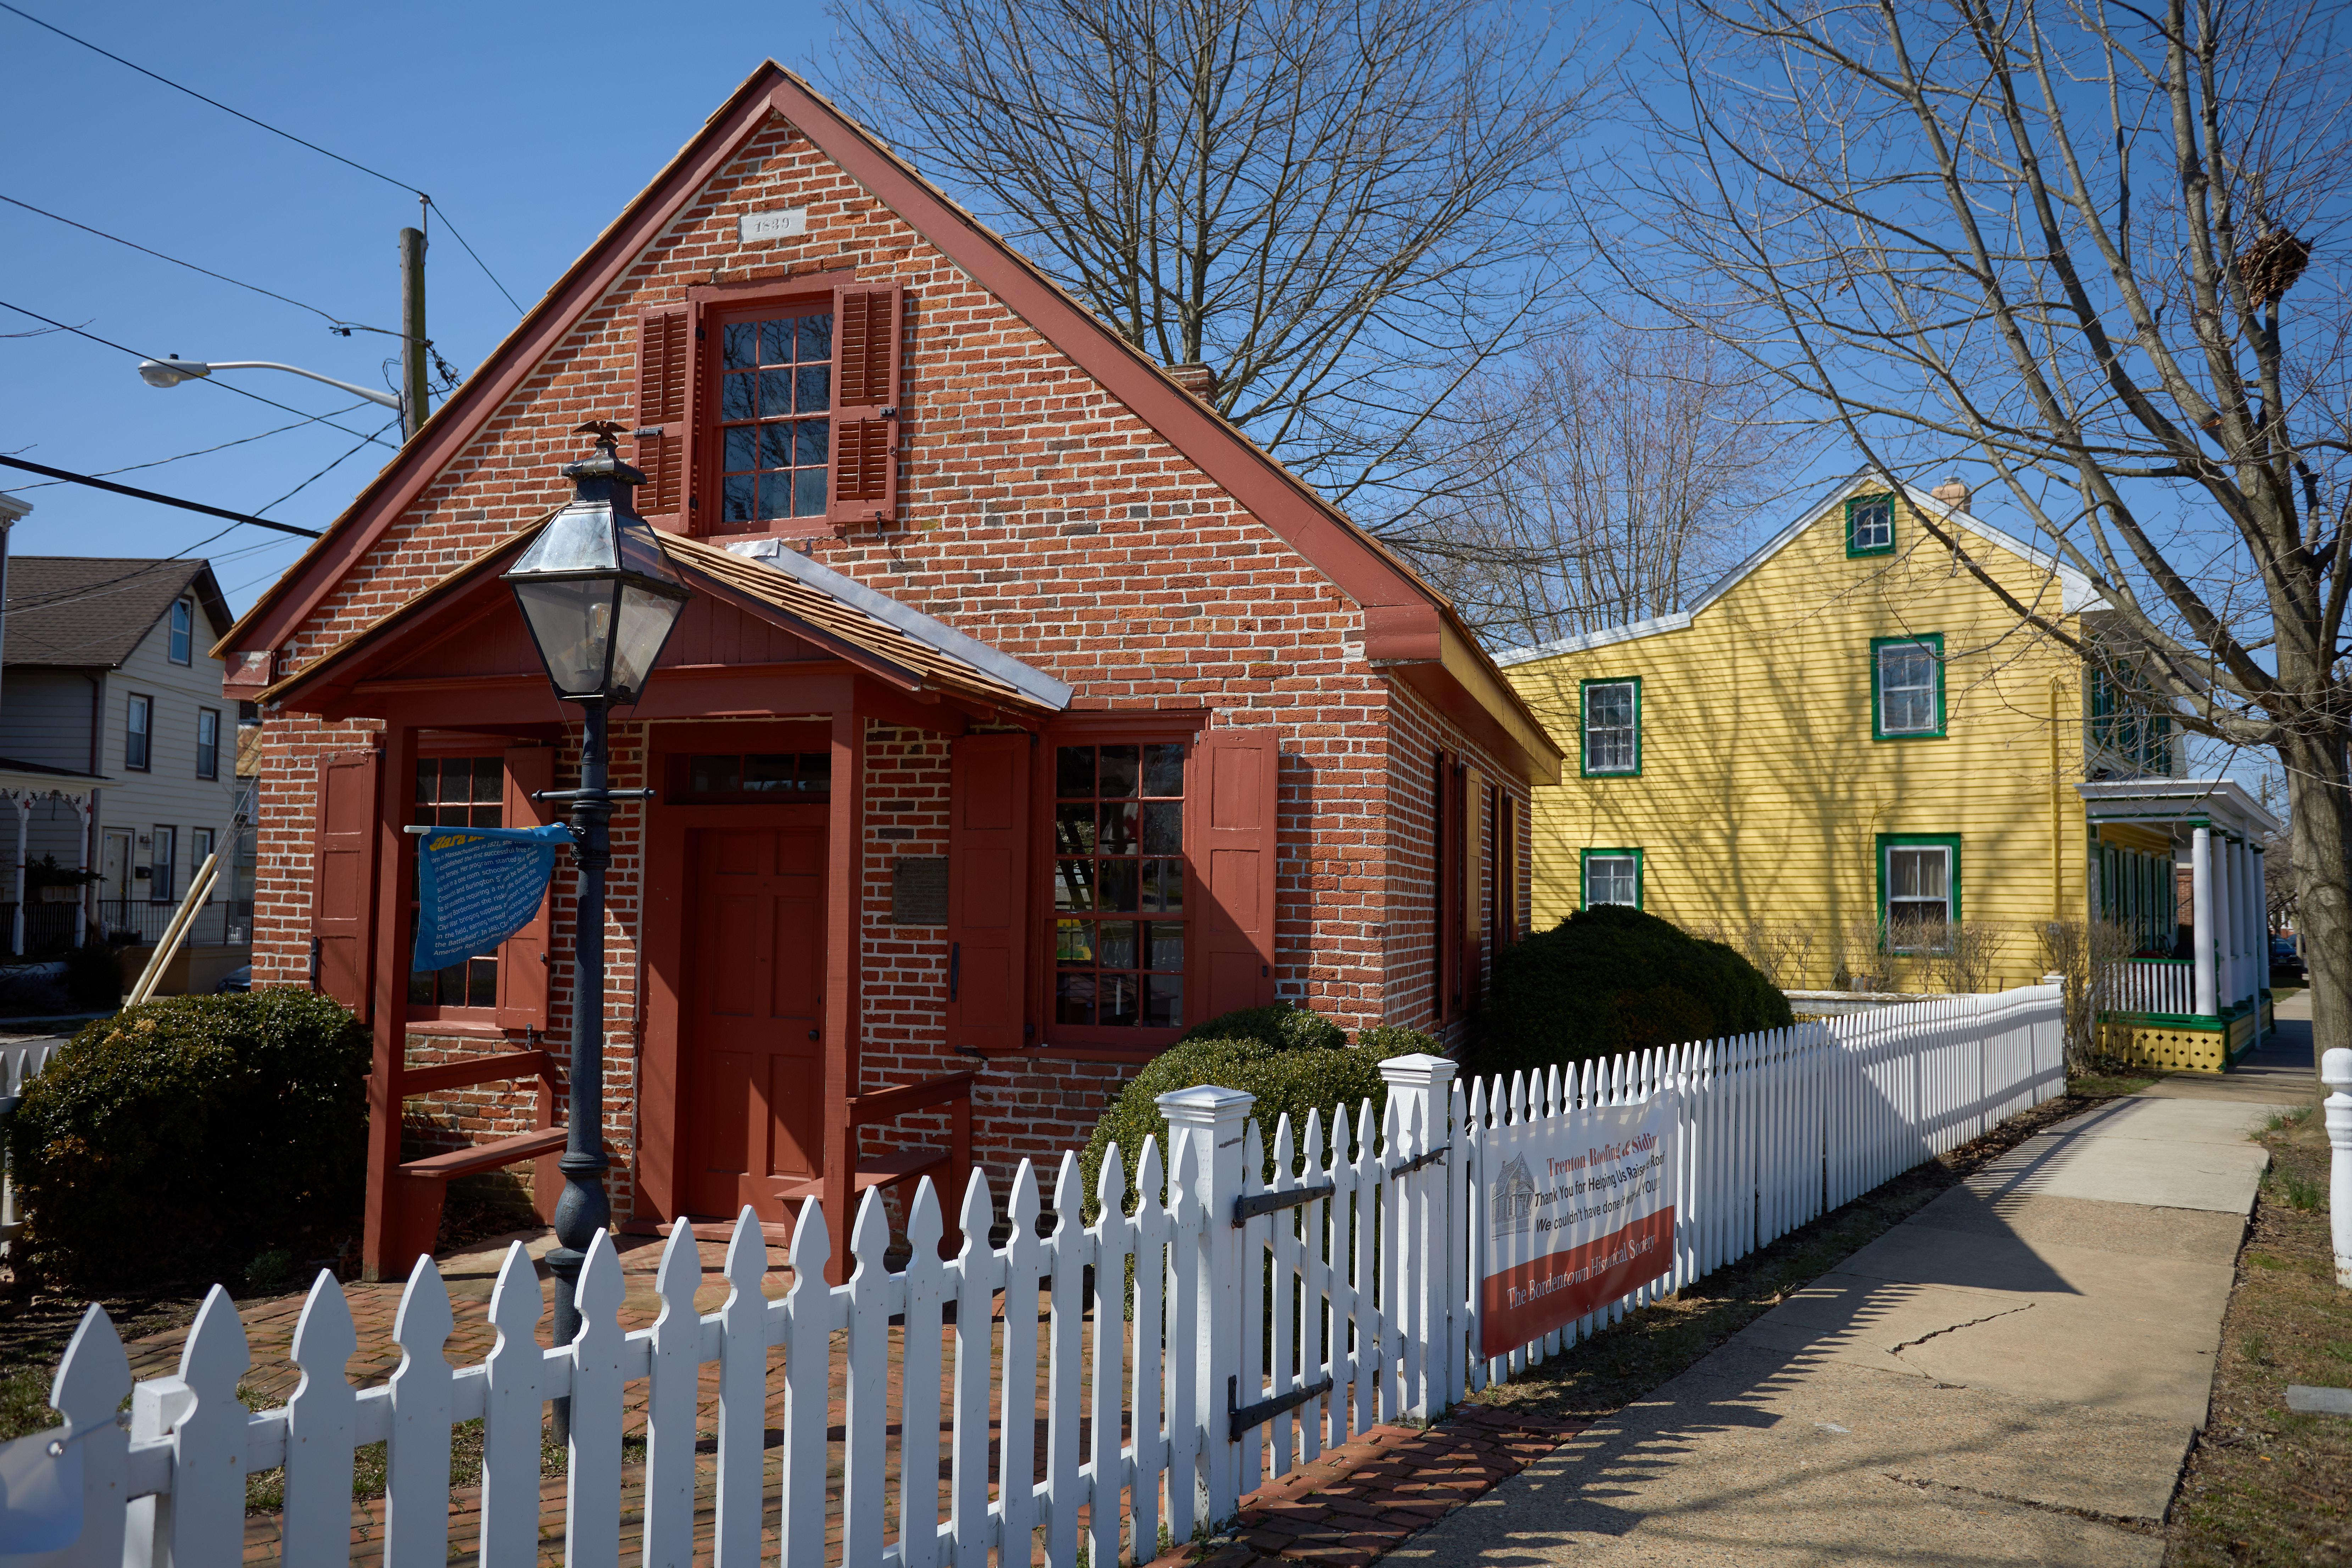 Exterior of Clara Barton Schoolhouse.